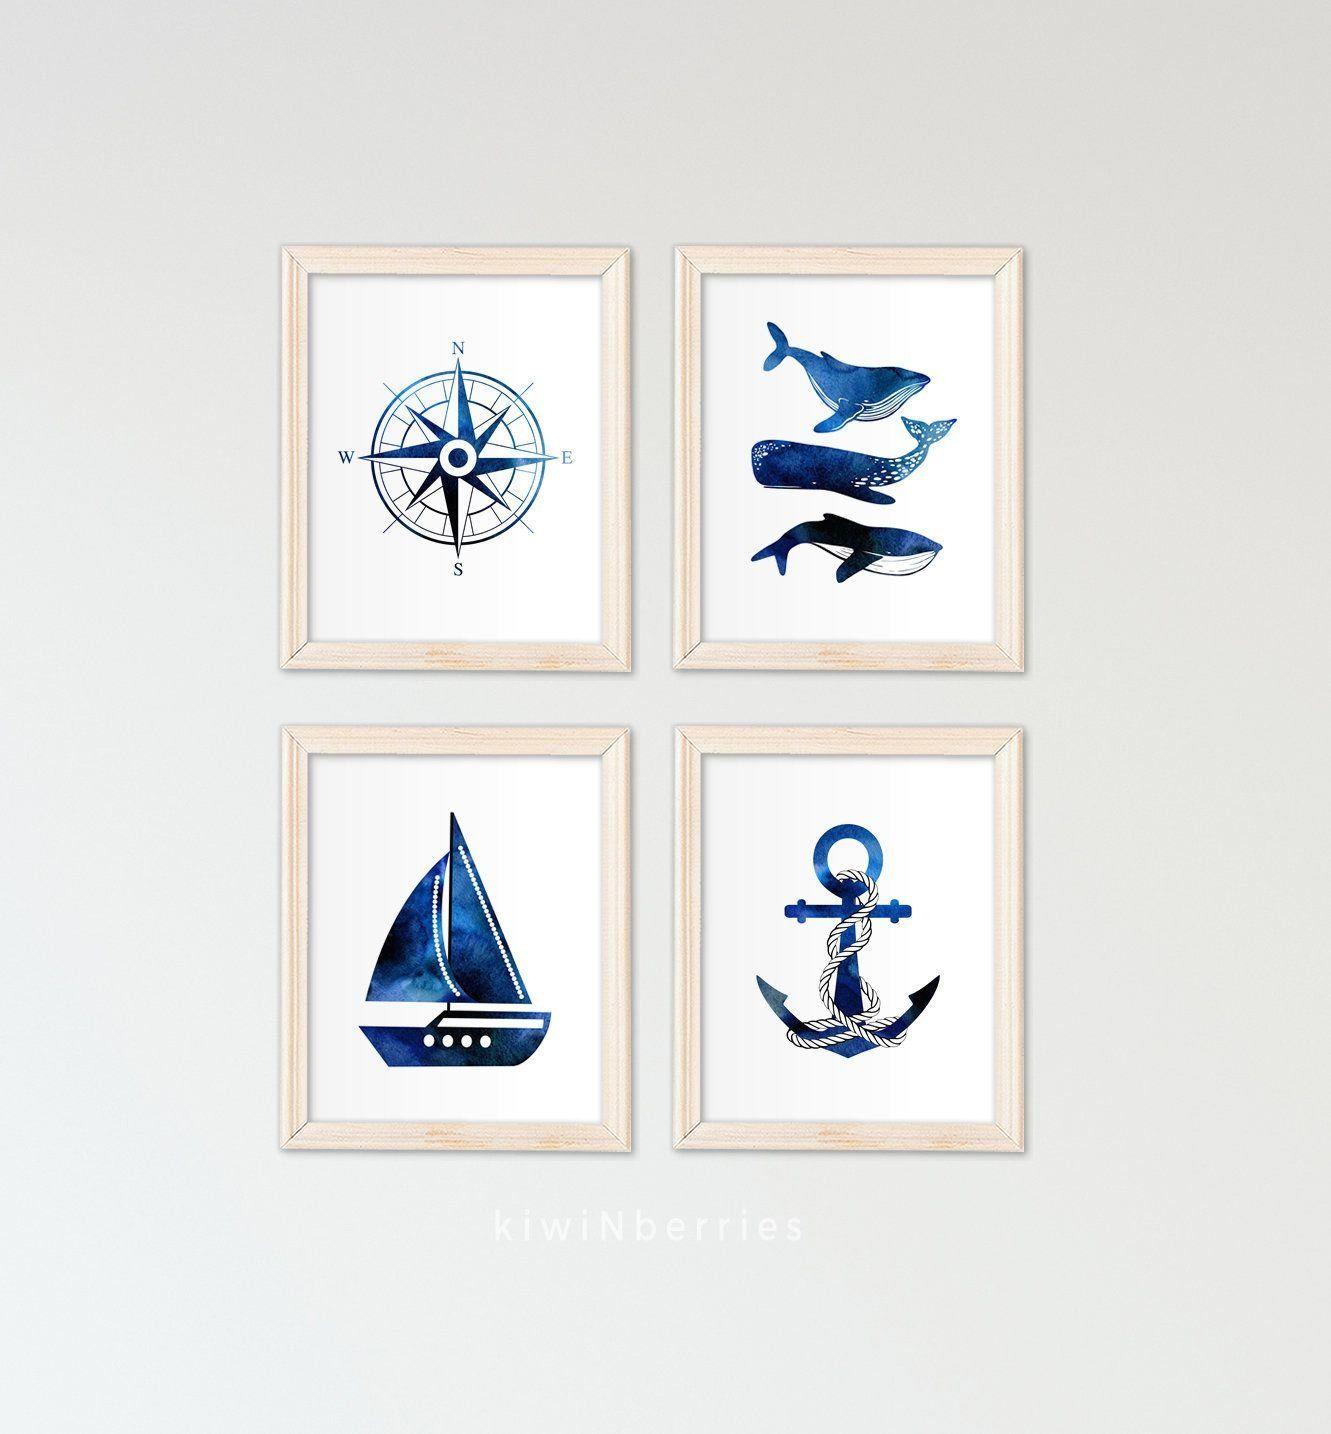 Baby Boy Nursery Decor Nautical Wall Art Whales Boat Anchor Navy Blue Watercolor Art Prints Boy S W Nautical Wall Art Boy Wall Art Baby Boy Nursery Decor